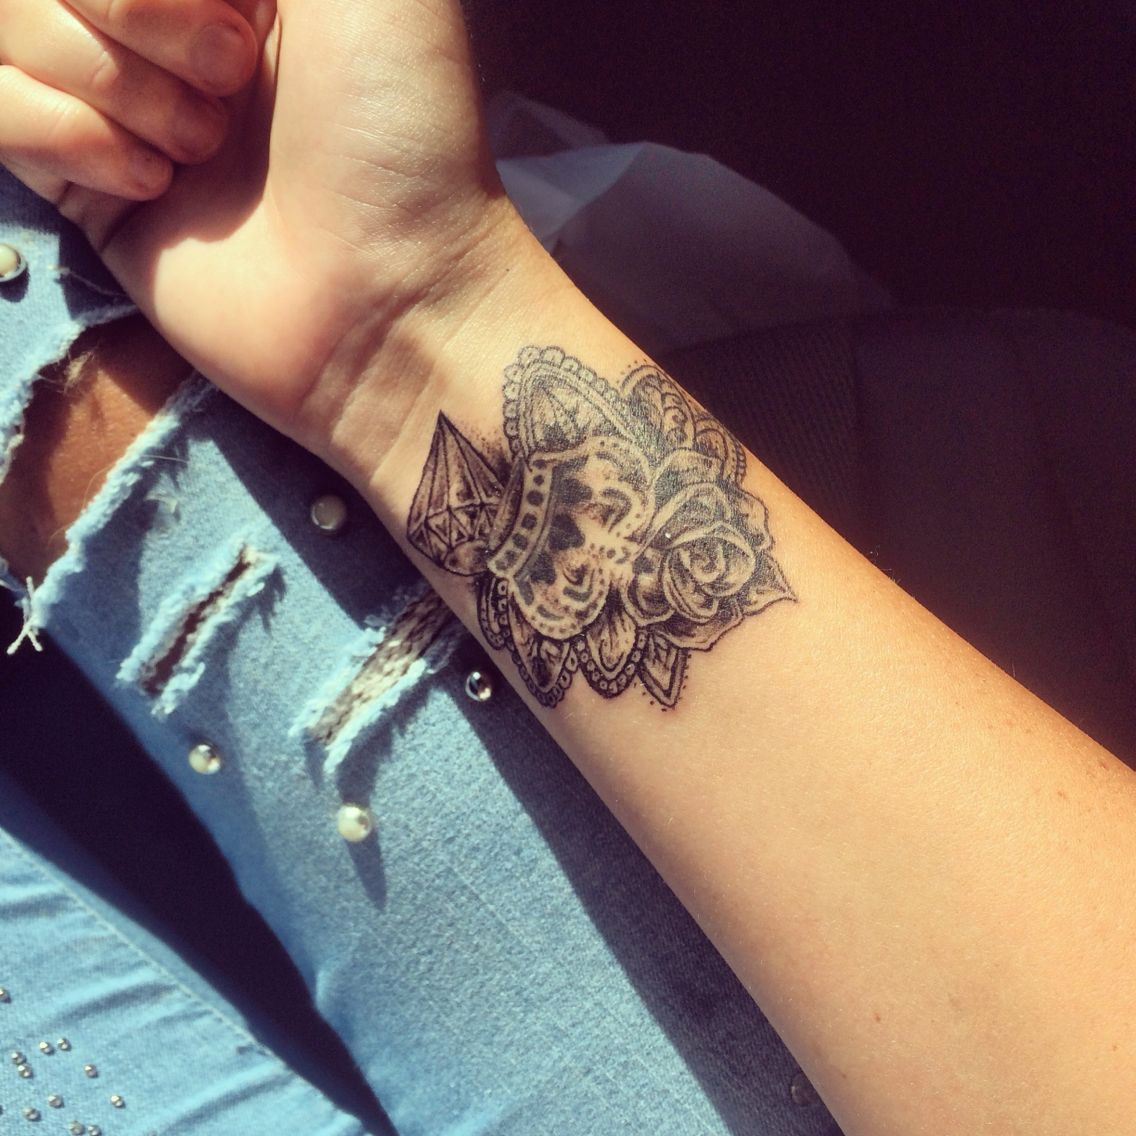 Rose Tattoo Around Wrist: Wrist Tattoo, Rose, Crown, Diamond, Leafs